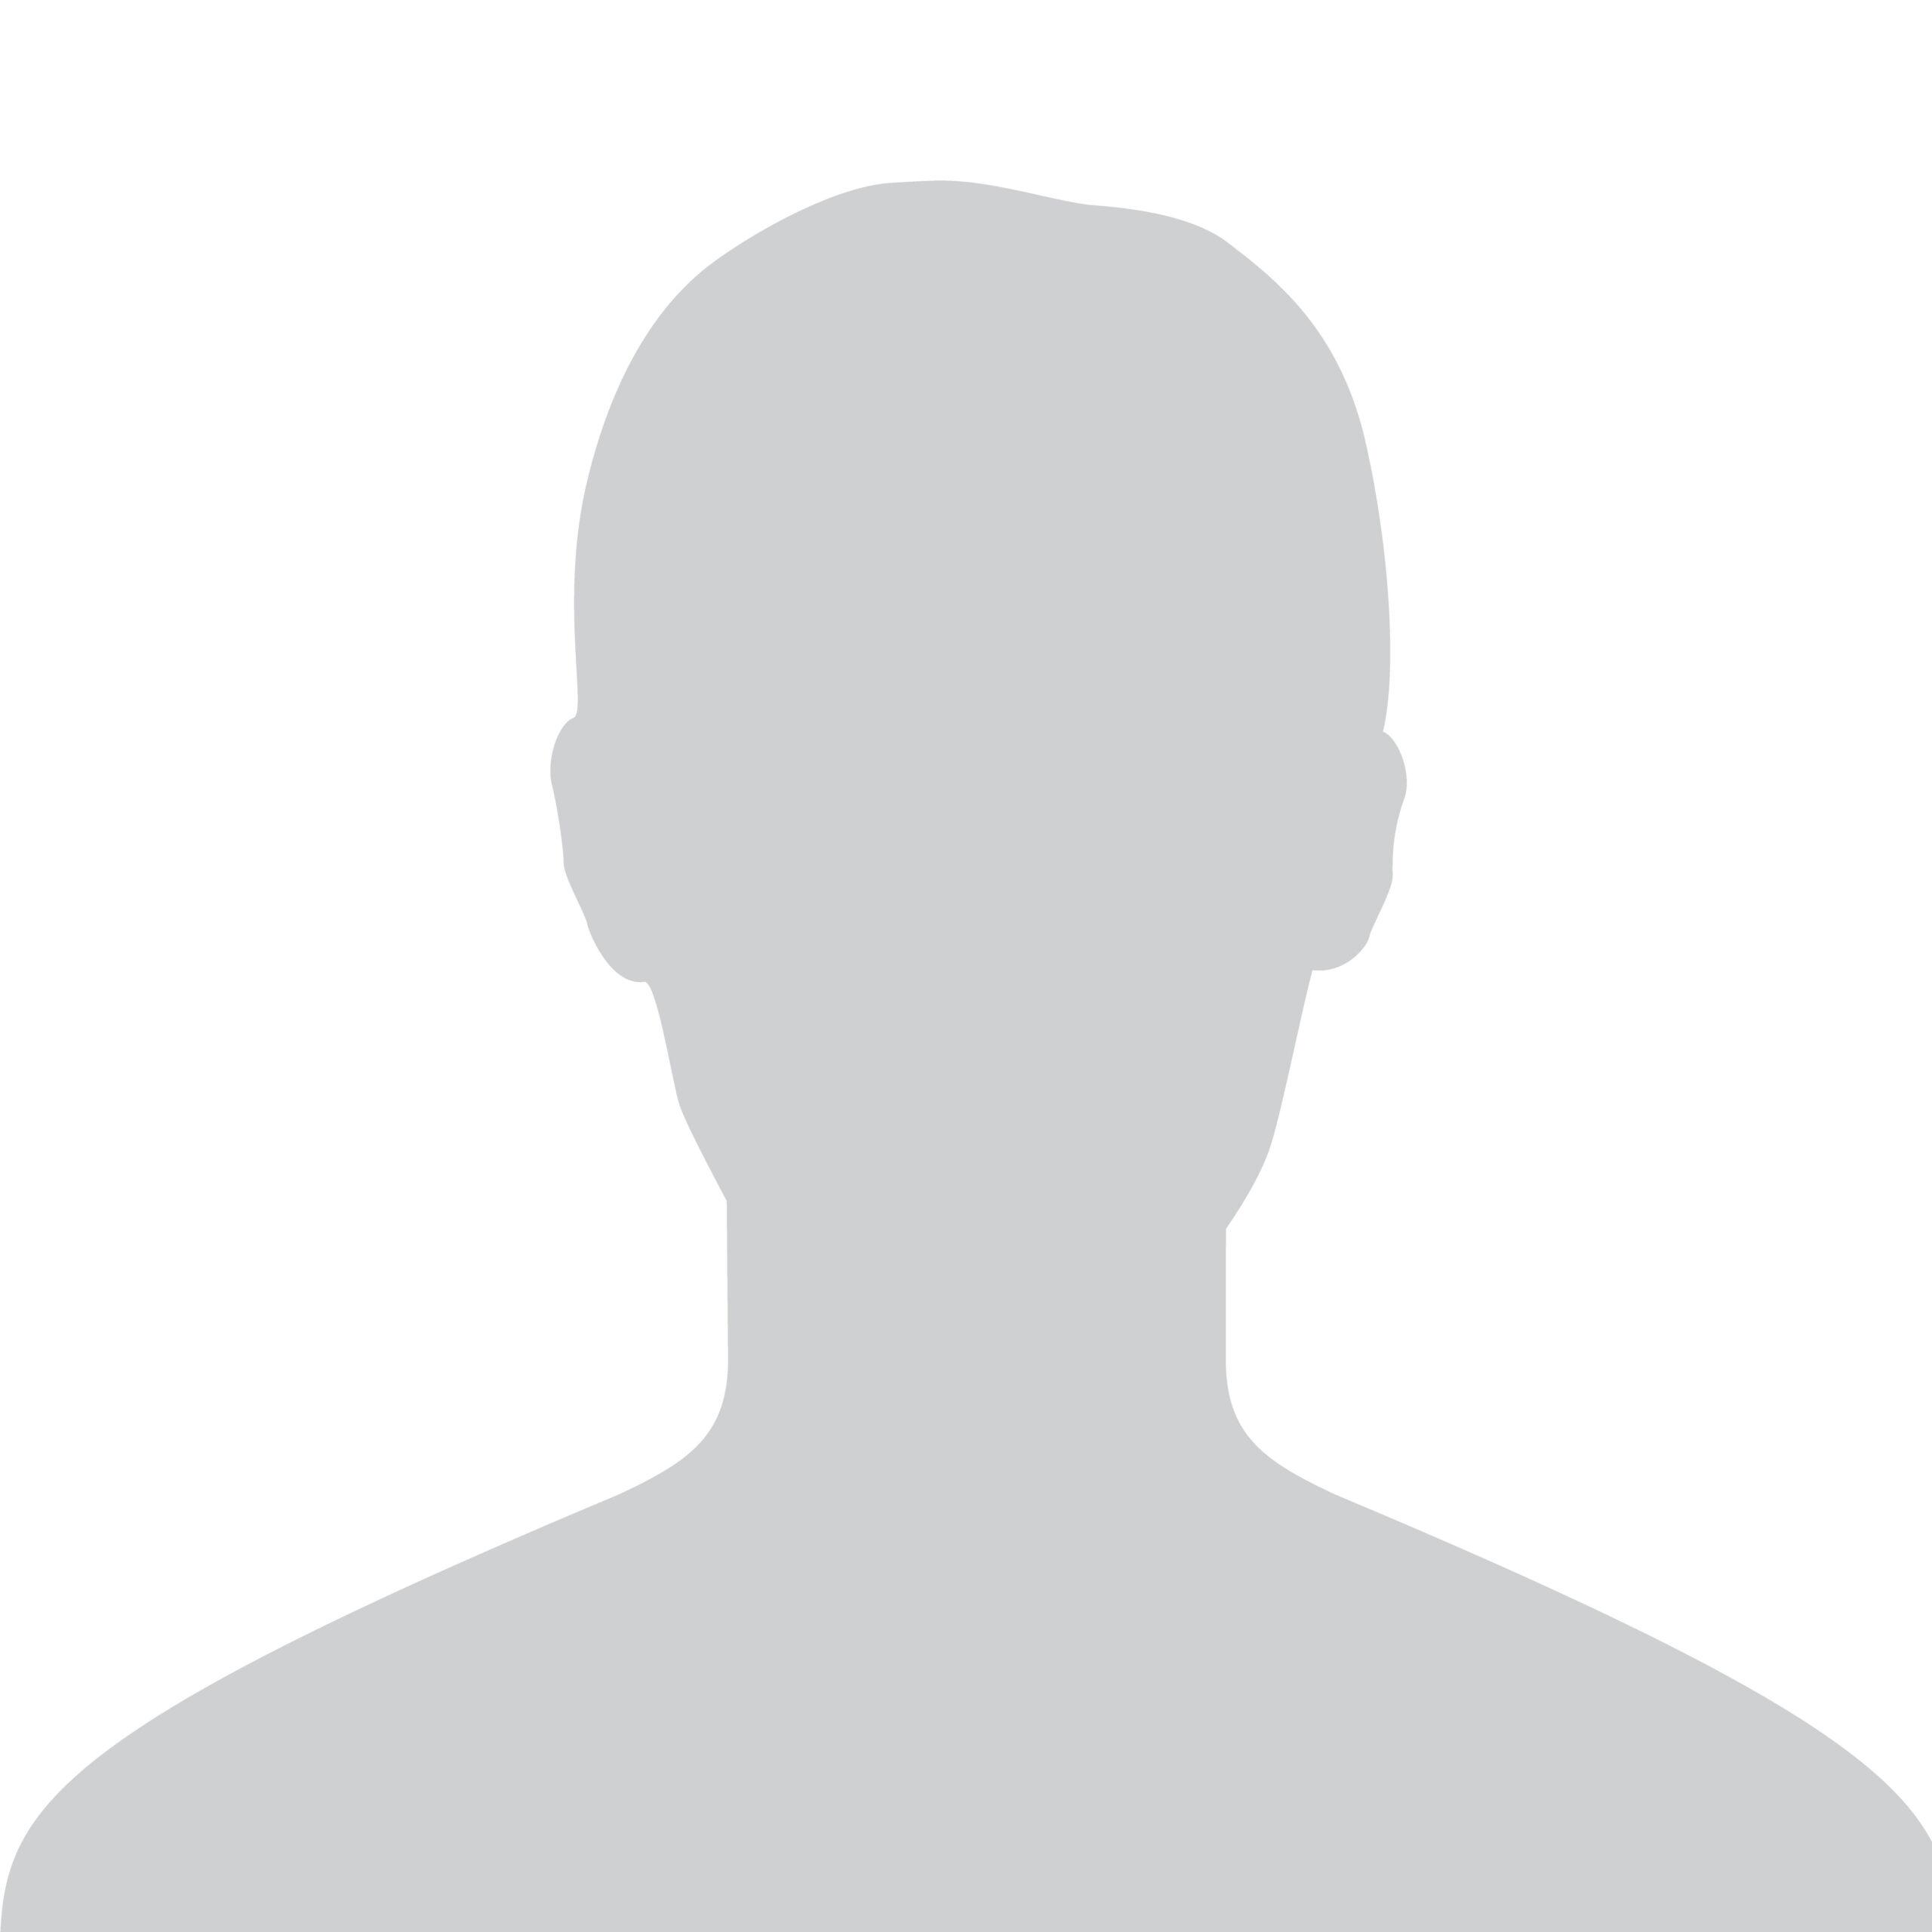 Blank profile photo graphic